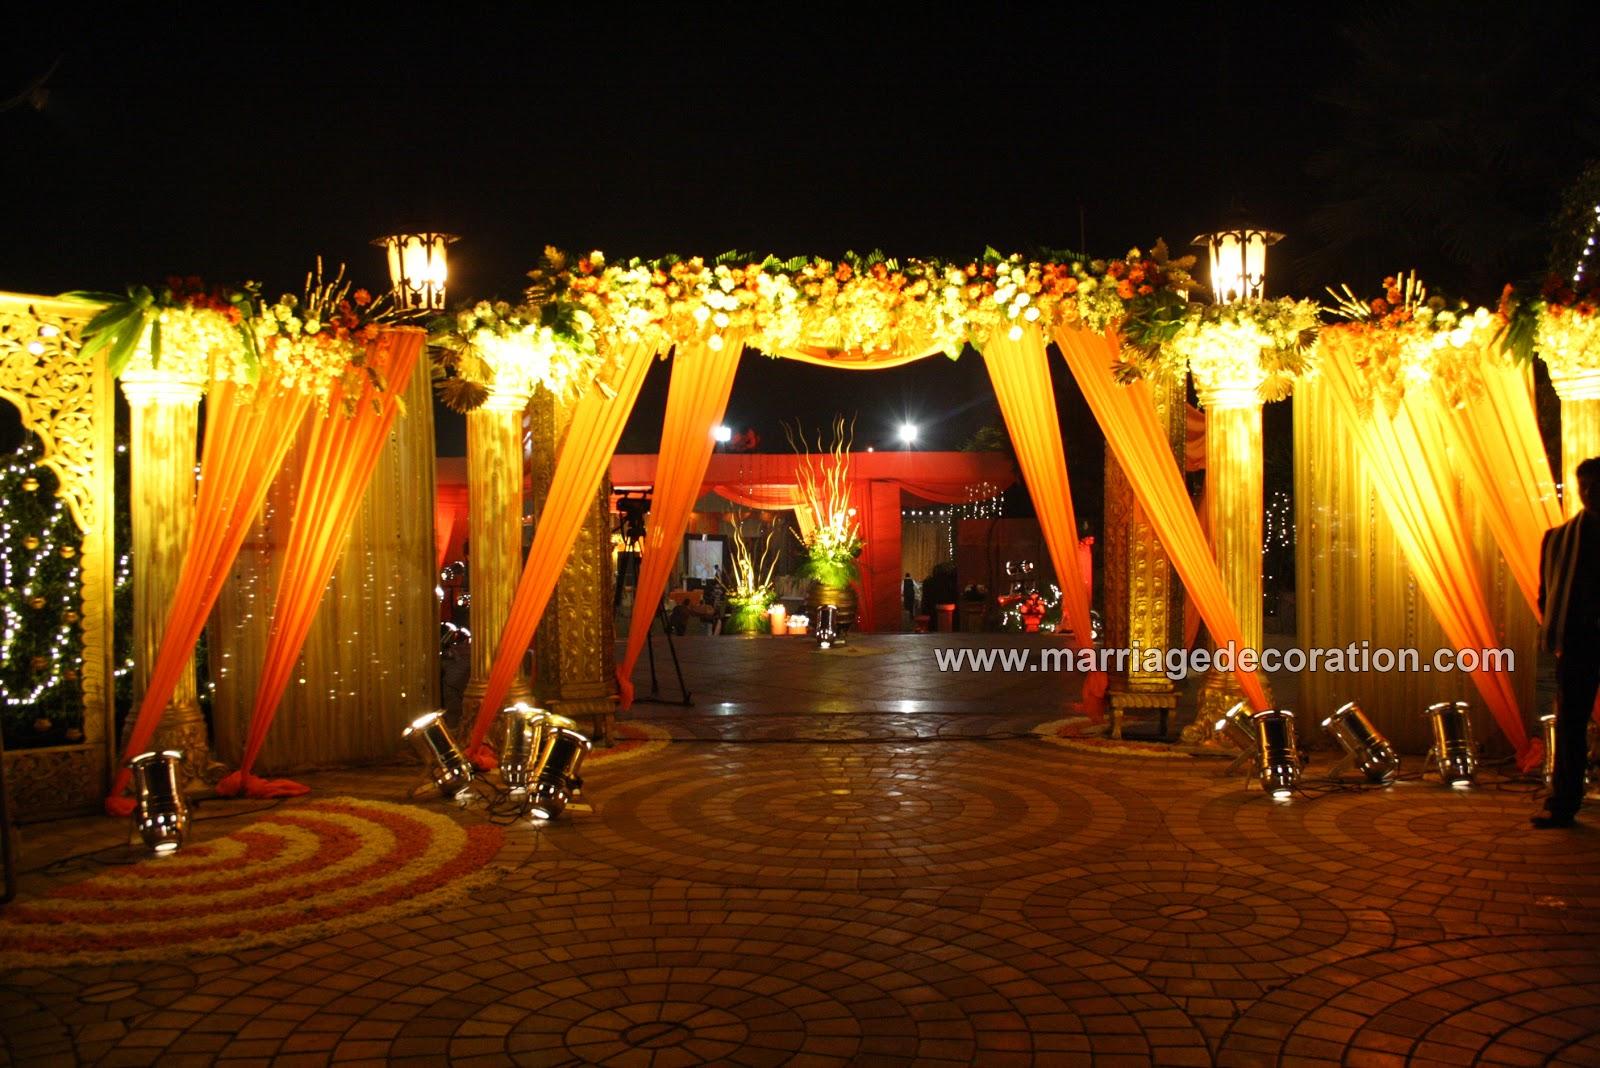 Decoration,wedding decoration,wedding stage decoration pictures,halls